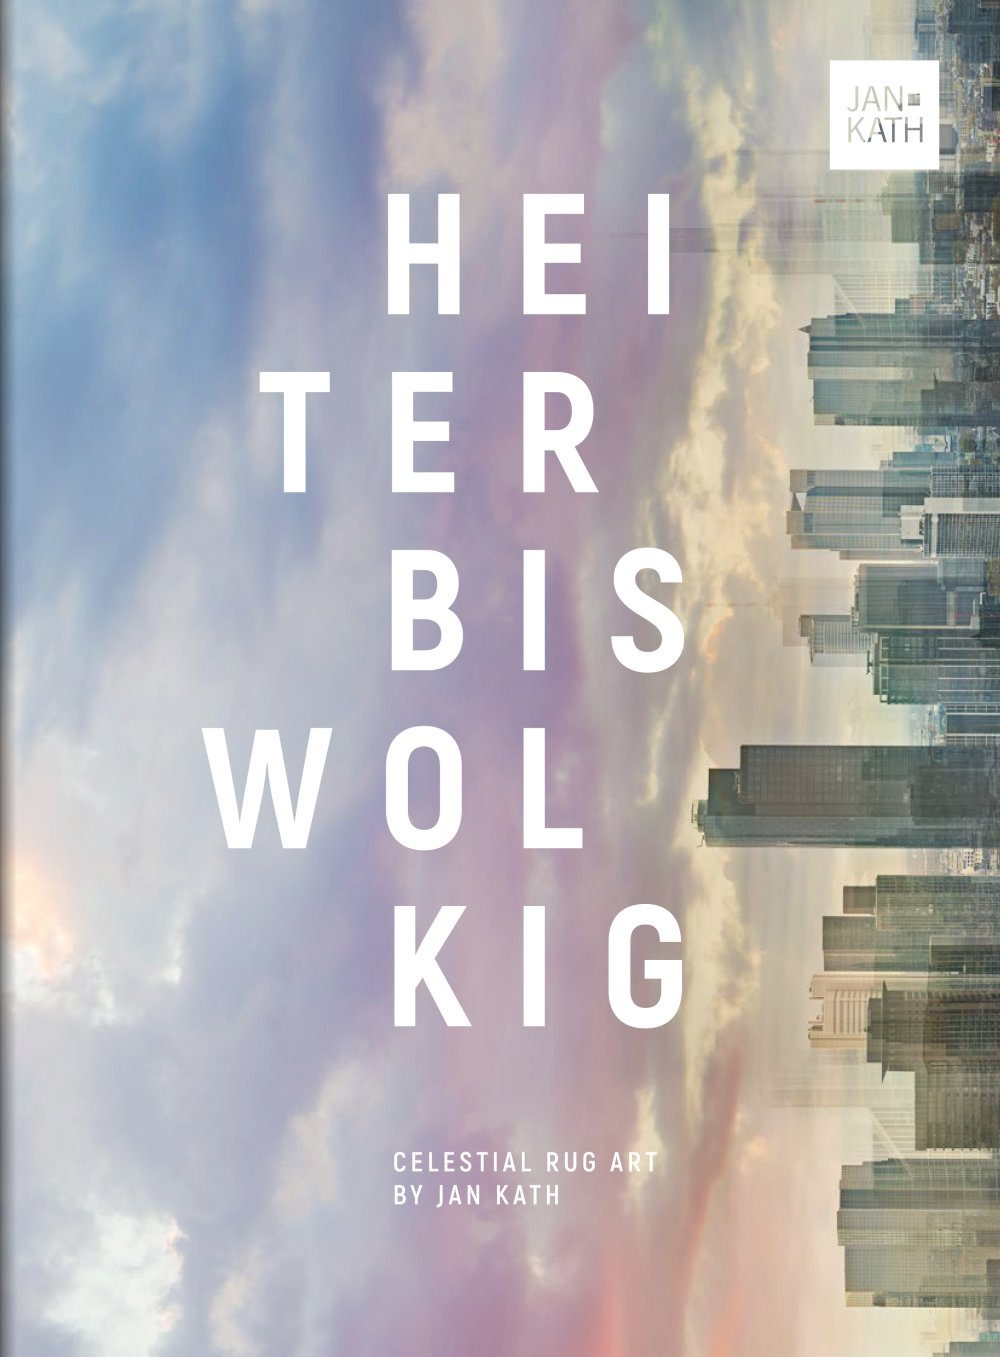 Jan Kath Köln heiter bis wolkig jan kath contemporary rug pdf catalogues